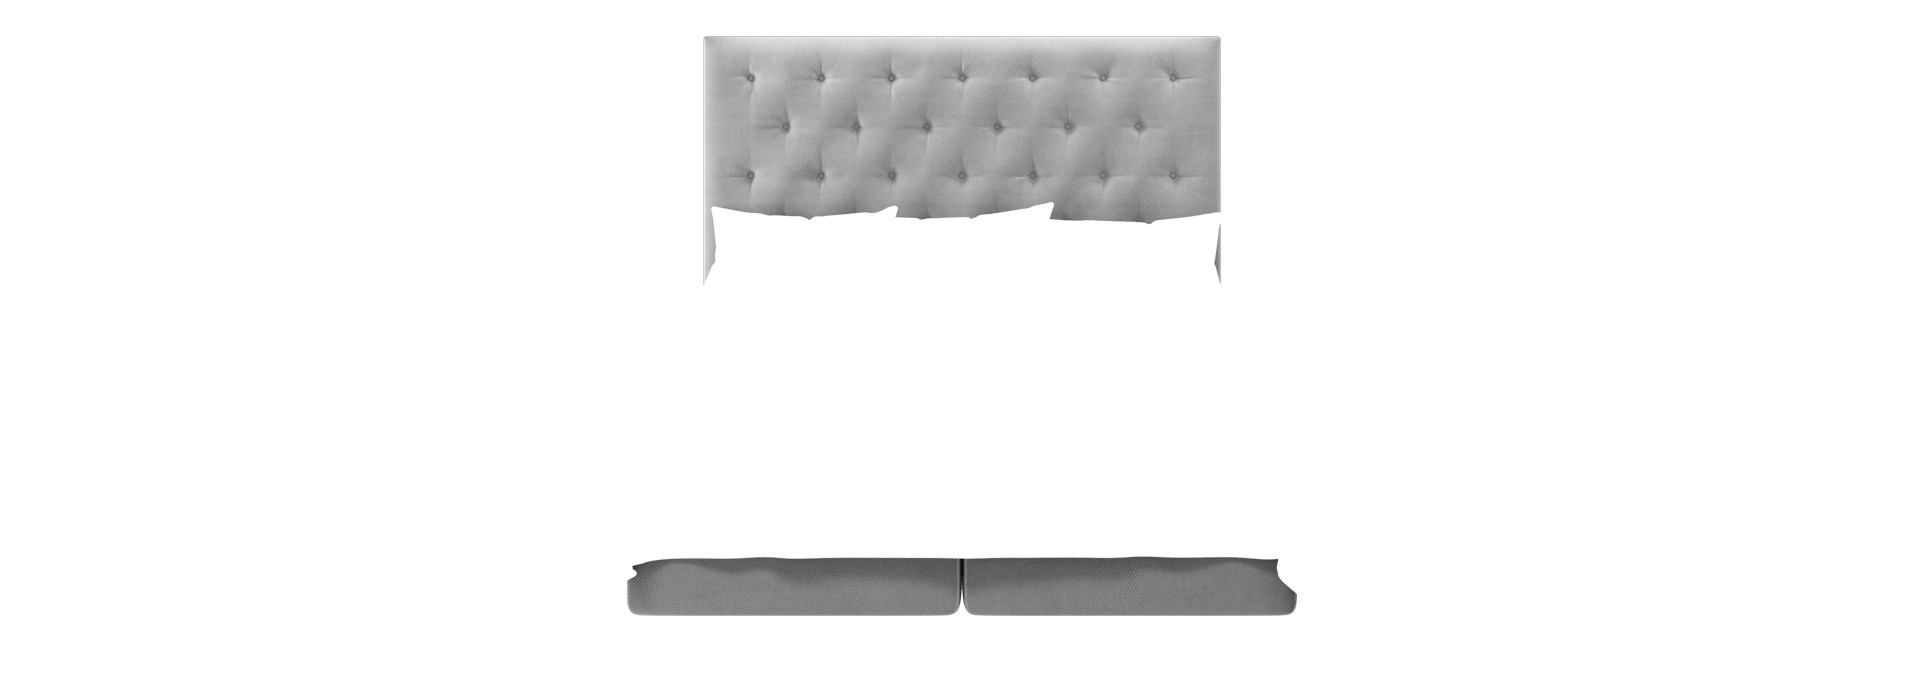 Естер 1.6 ліжко box spring - маска 1